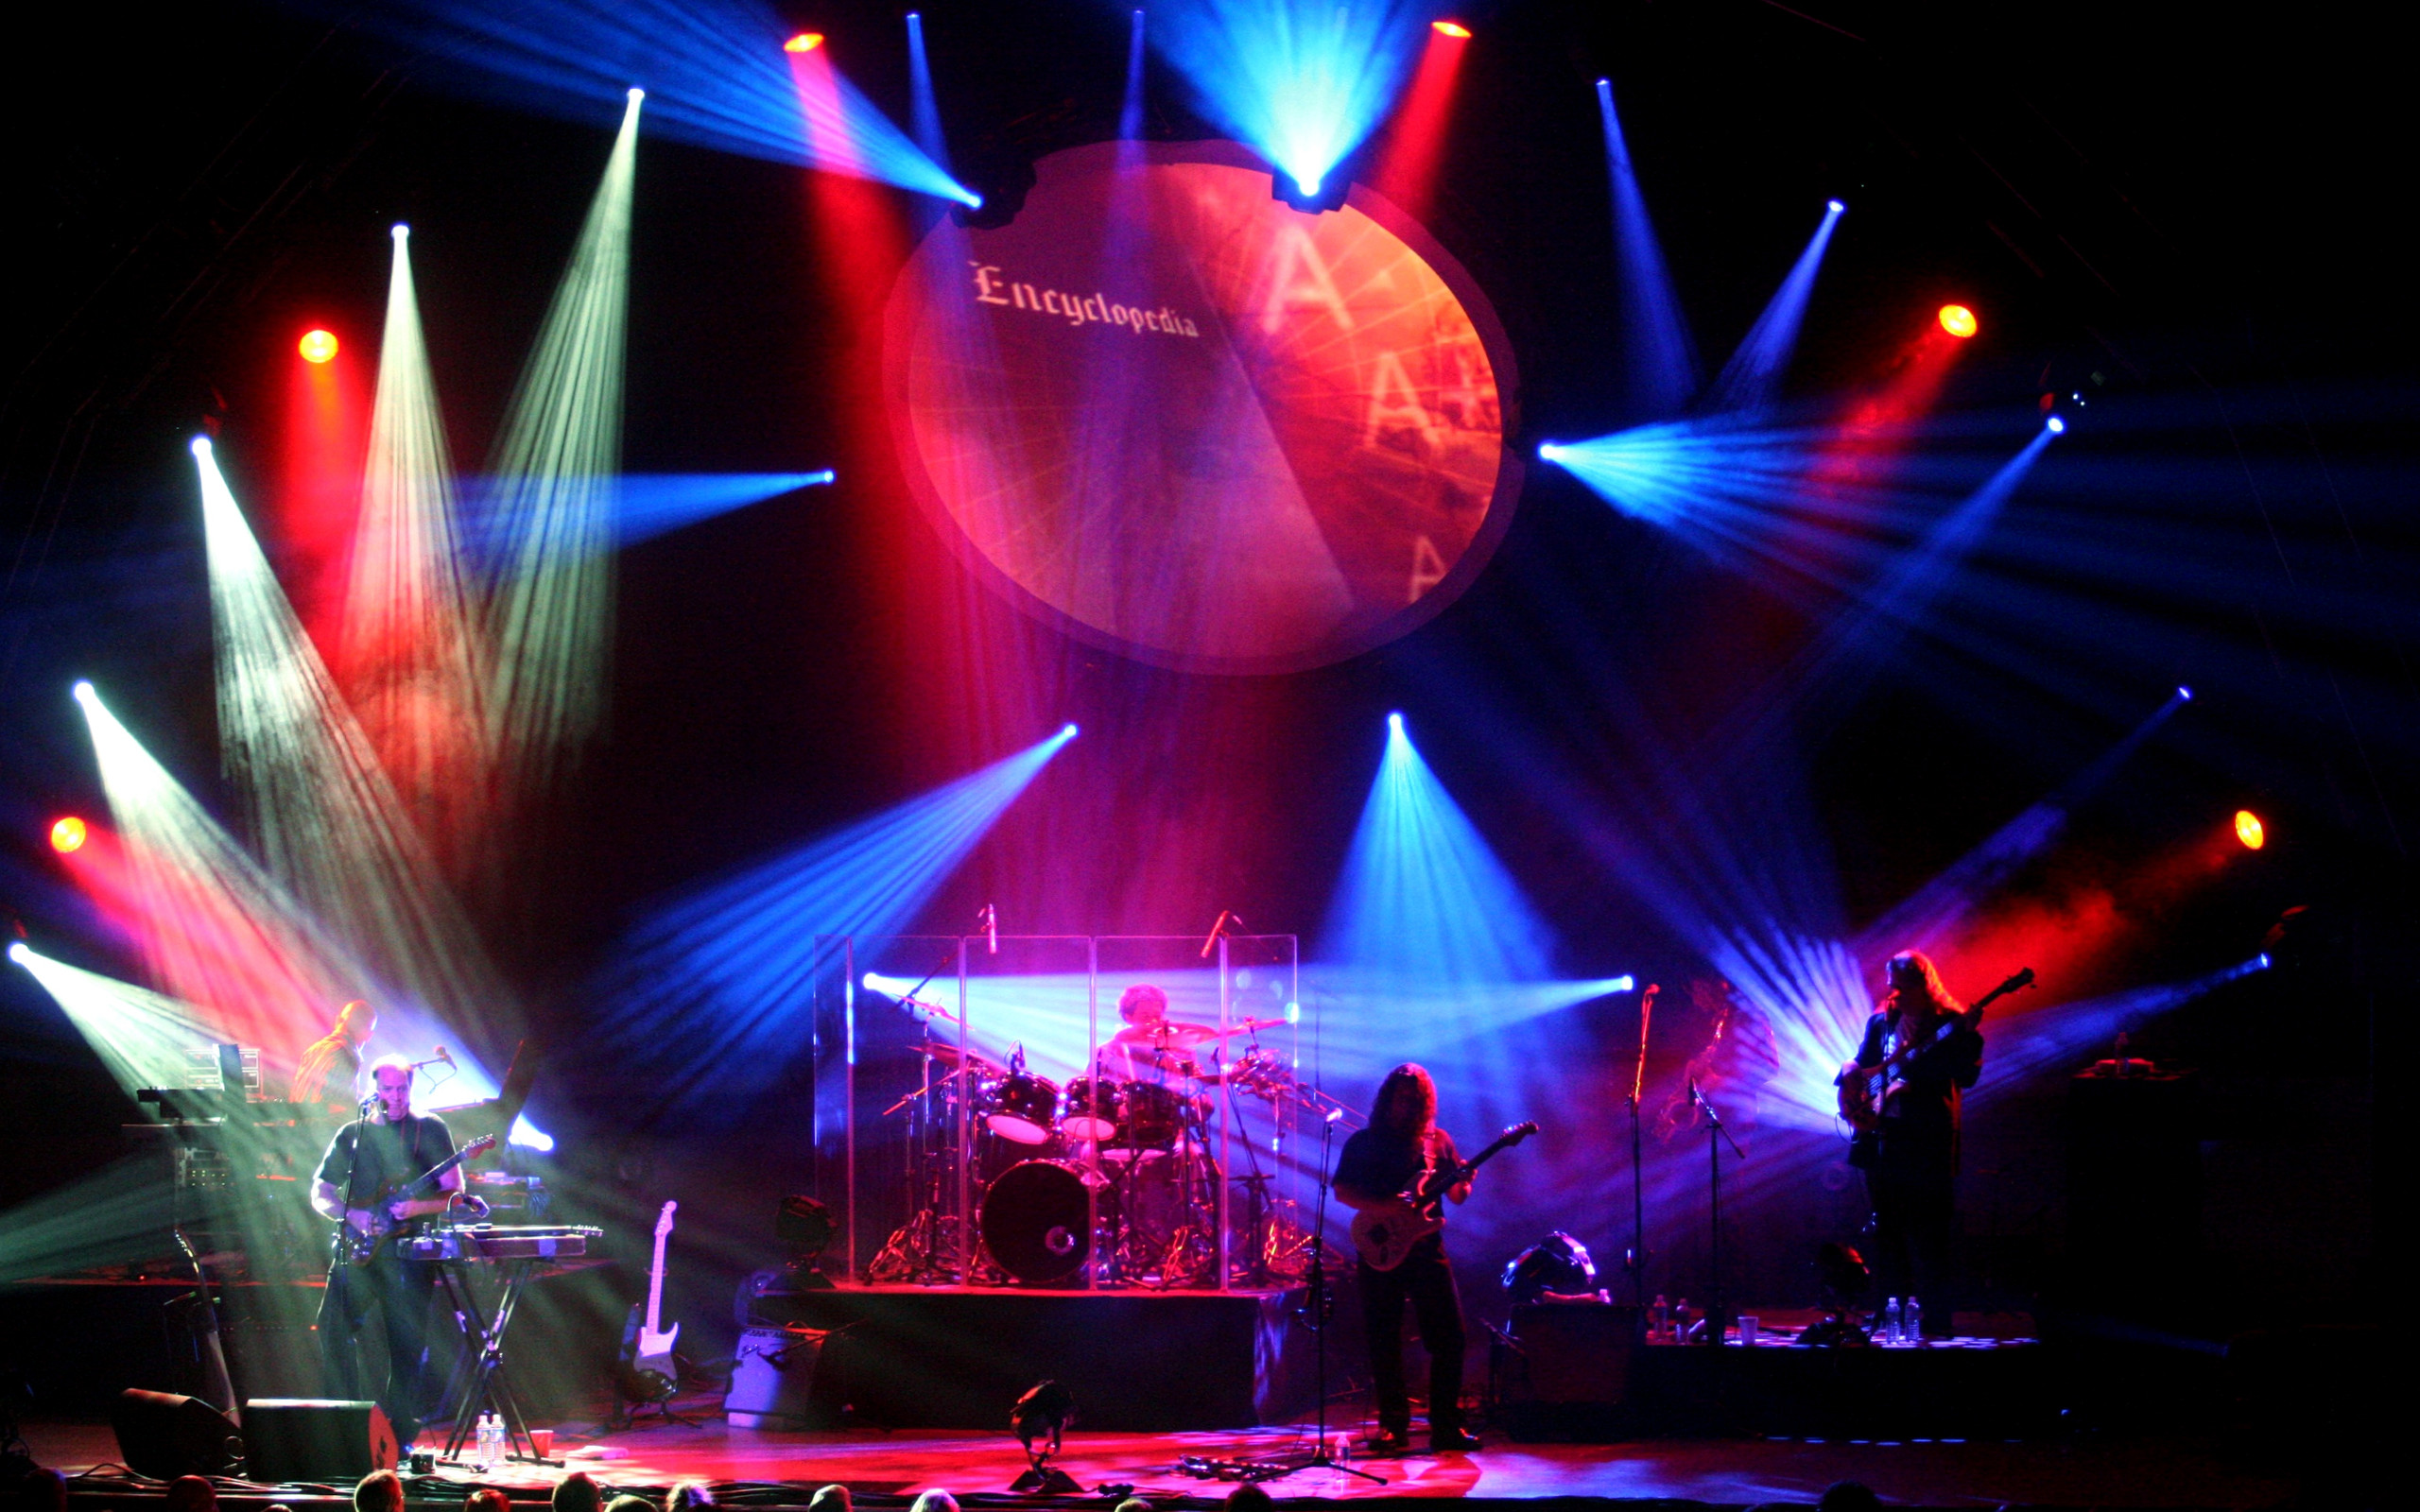 Best-Pink-Floyd-Wallpapers-High-Resolution